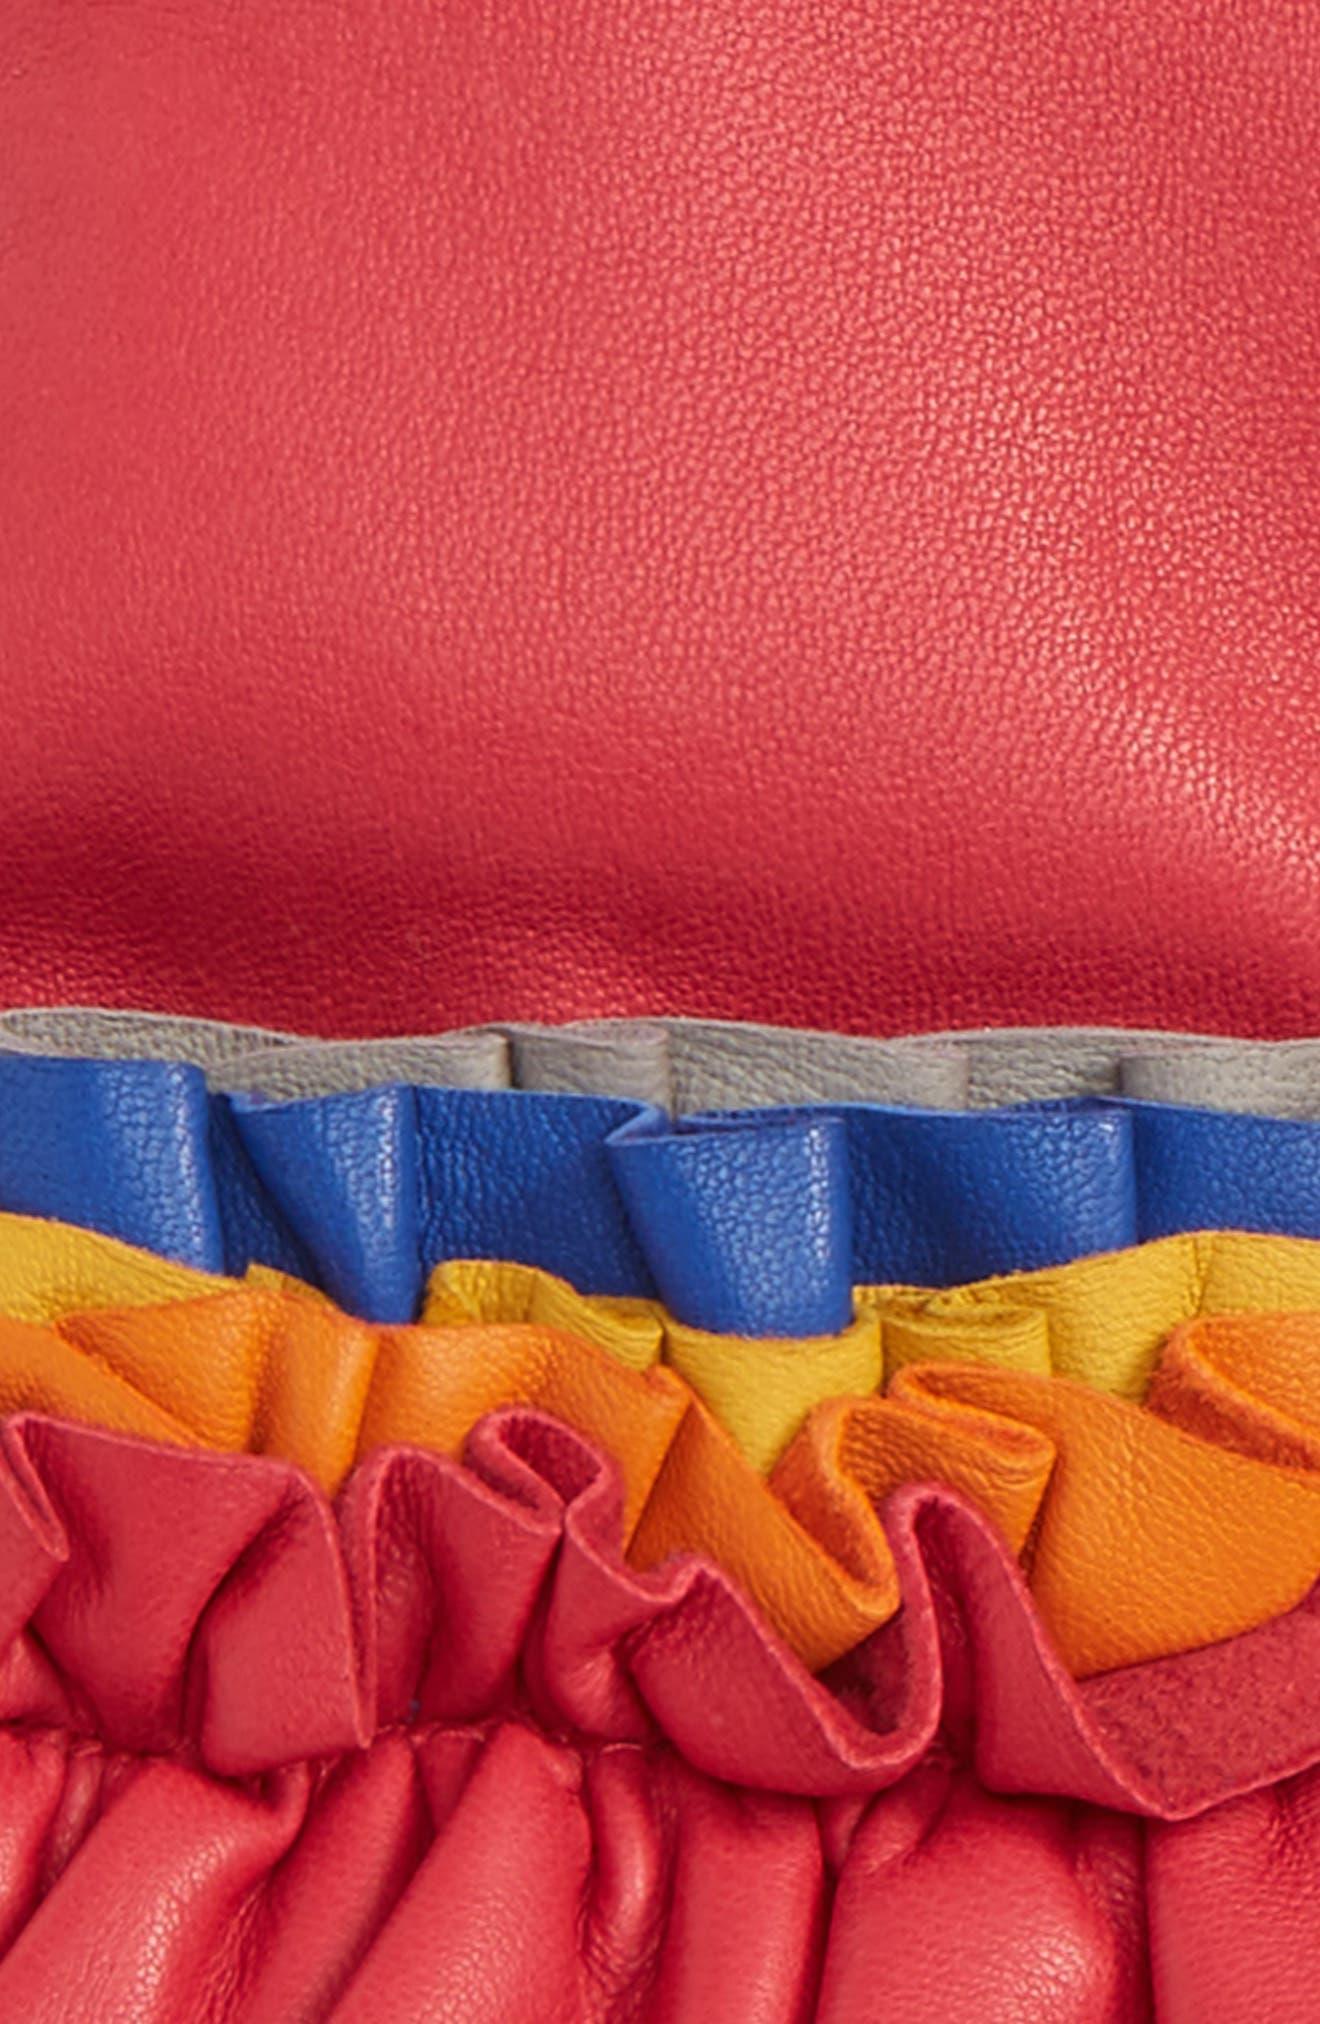 Ruffle Lambskin Leather Gloves,                             Alternate thumbnail 2, color,                             650